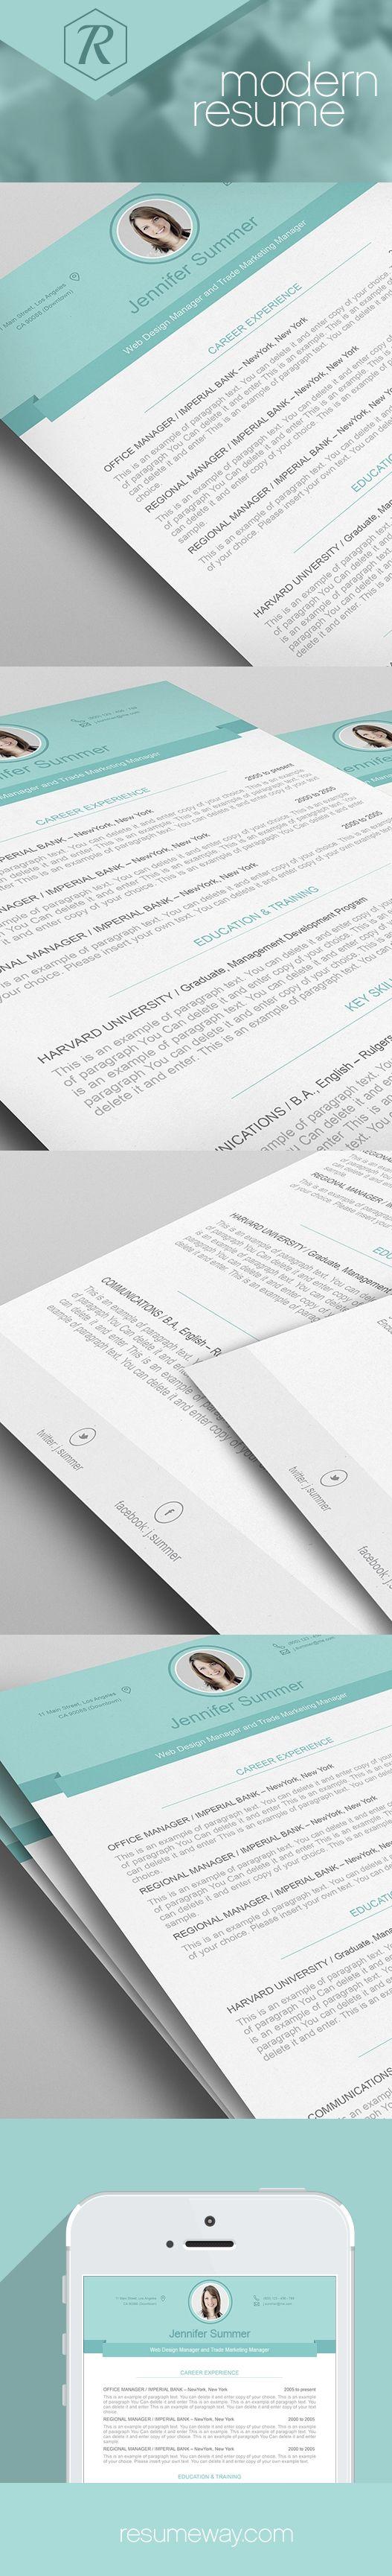 Modern resume template premium line of resume cover letter modern resume template premium line of resume cover letter templates edit with microsoft spiritdancerdesigns Choice Image